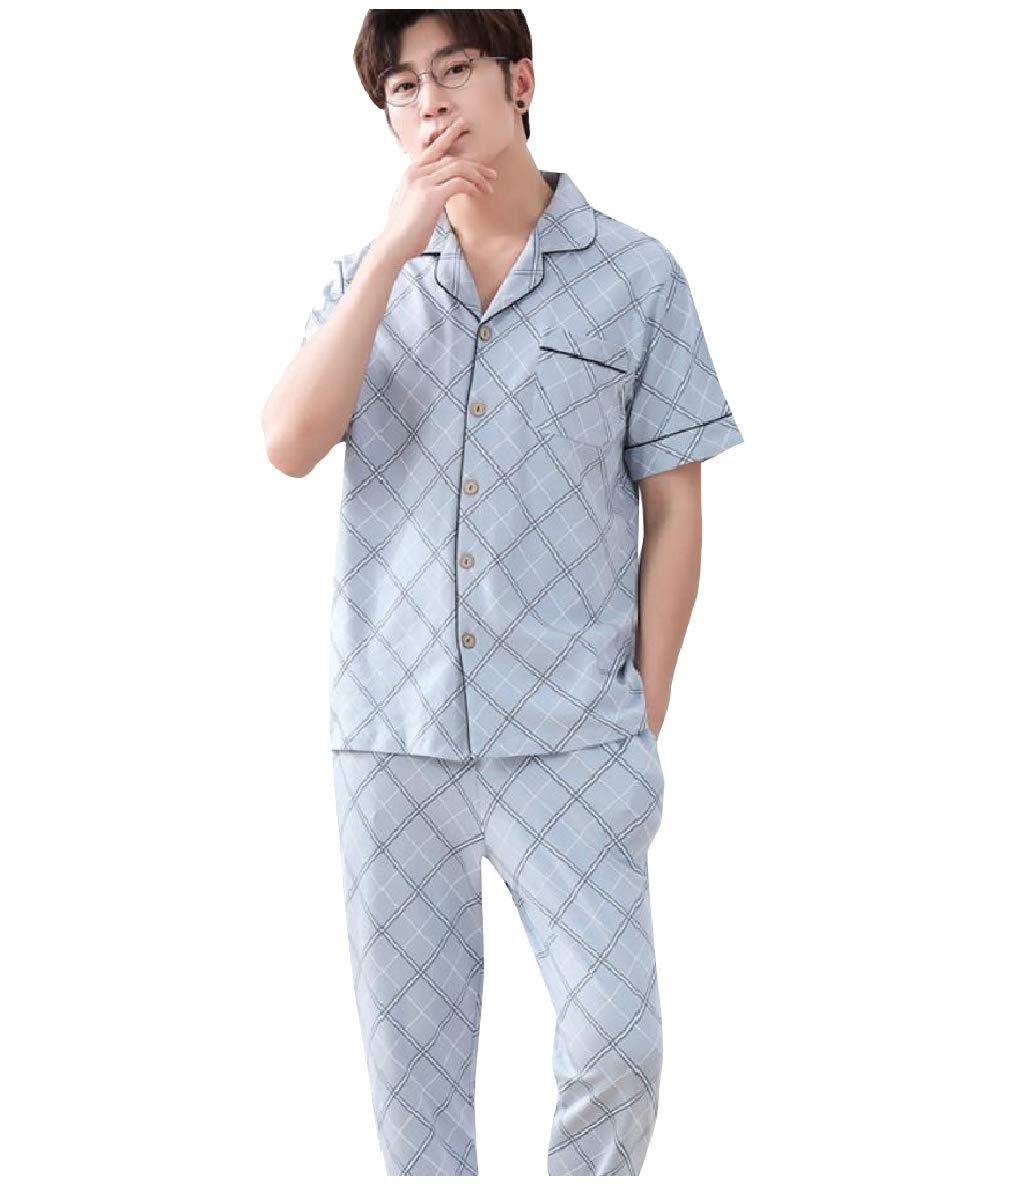 Vska Men Classic Plaid Fine Cotton 2 Piece Set Sleepwear Pants Sets Grey L